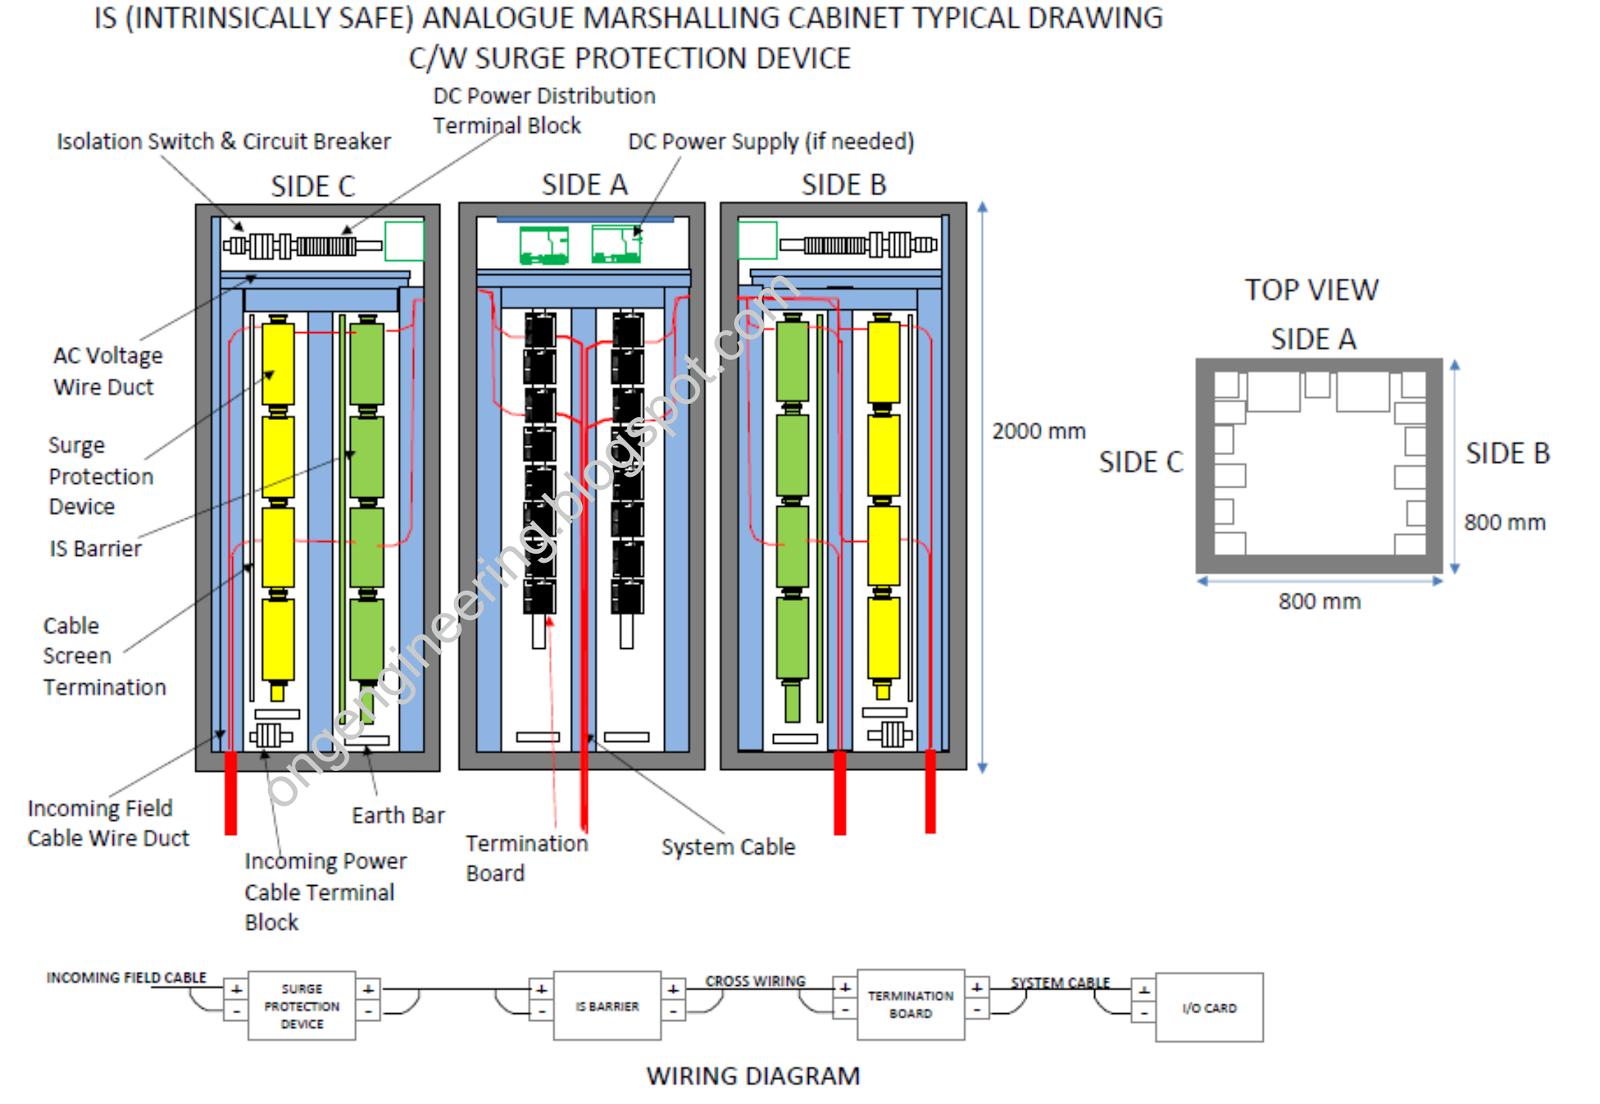 medium resolution of and gas industries in actual marshalling cabinet arrangement the equipment arrangement